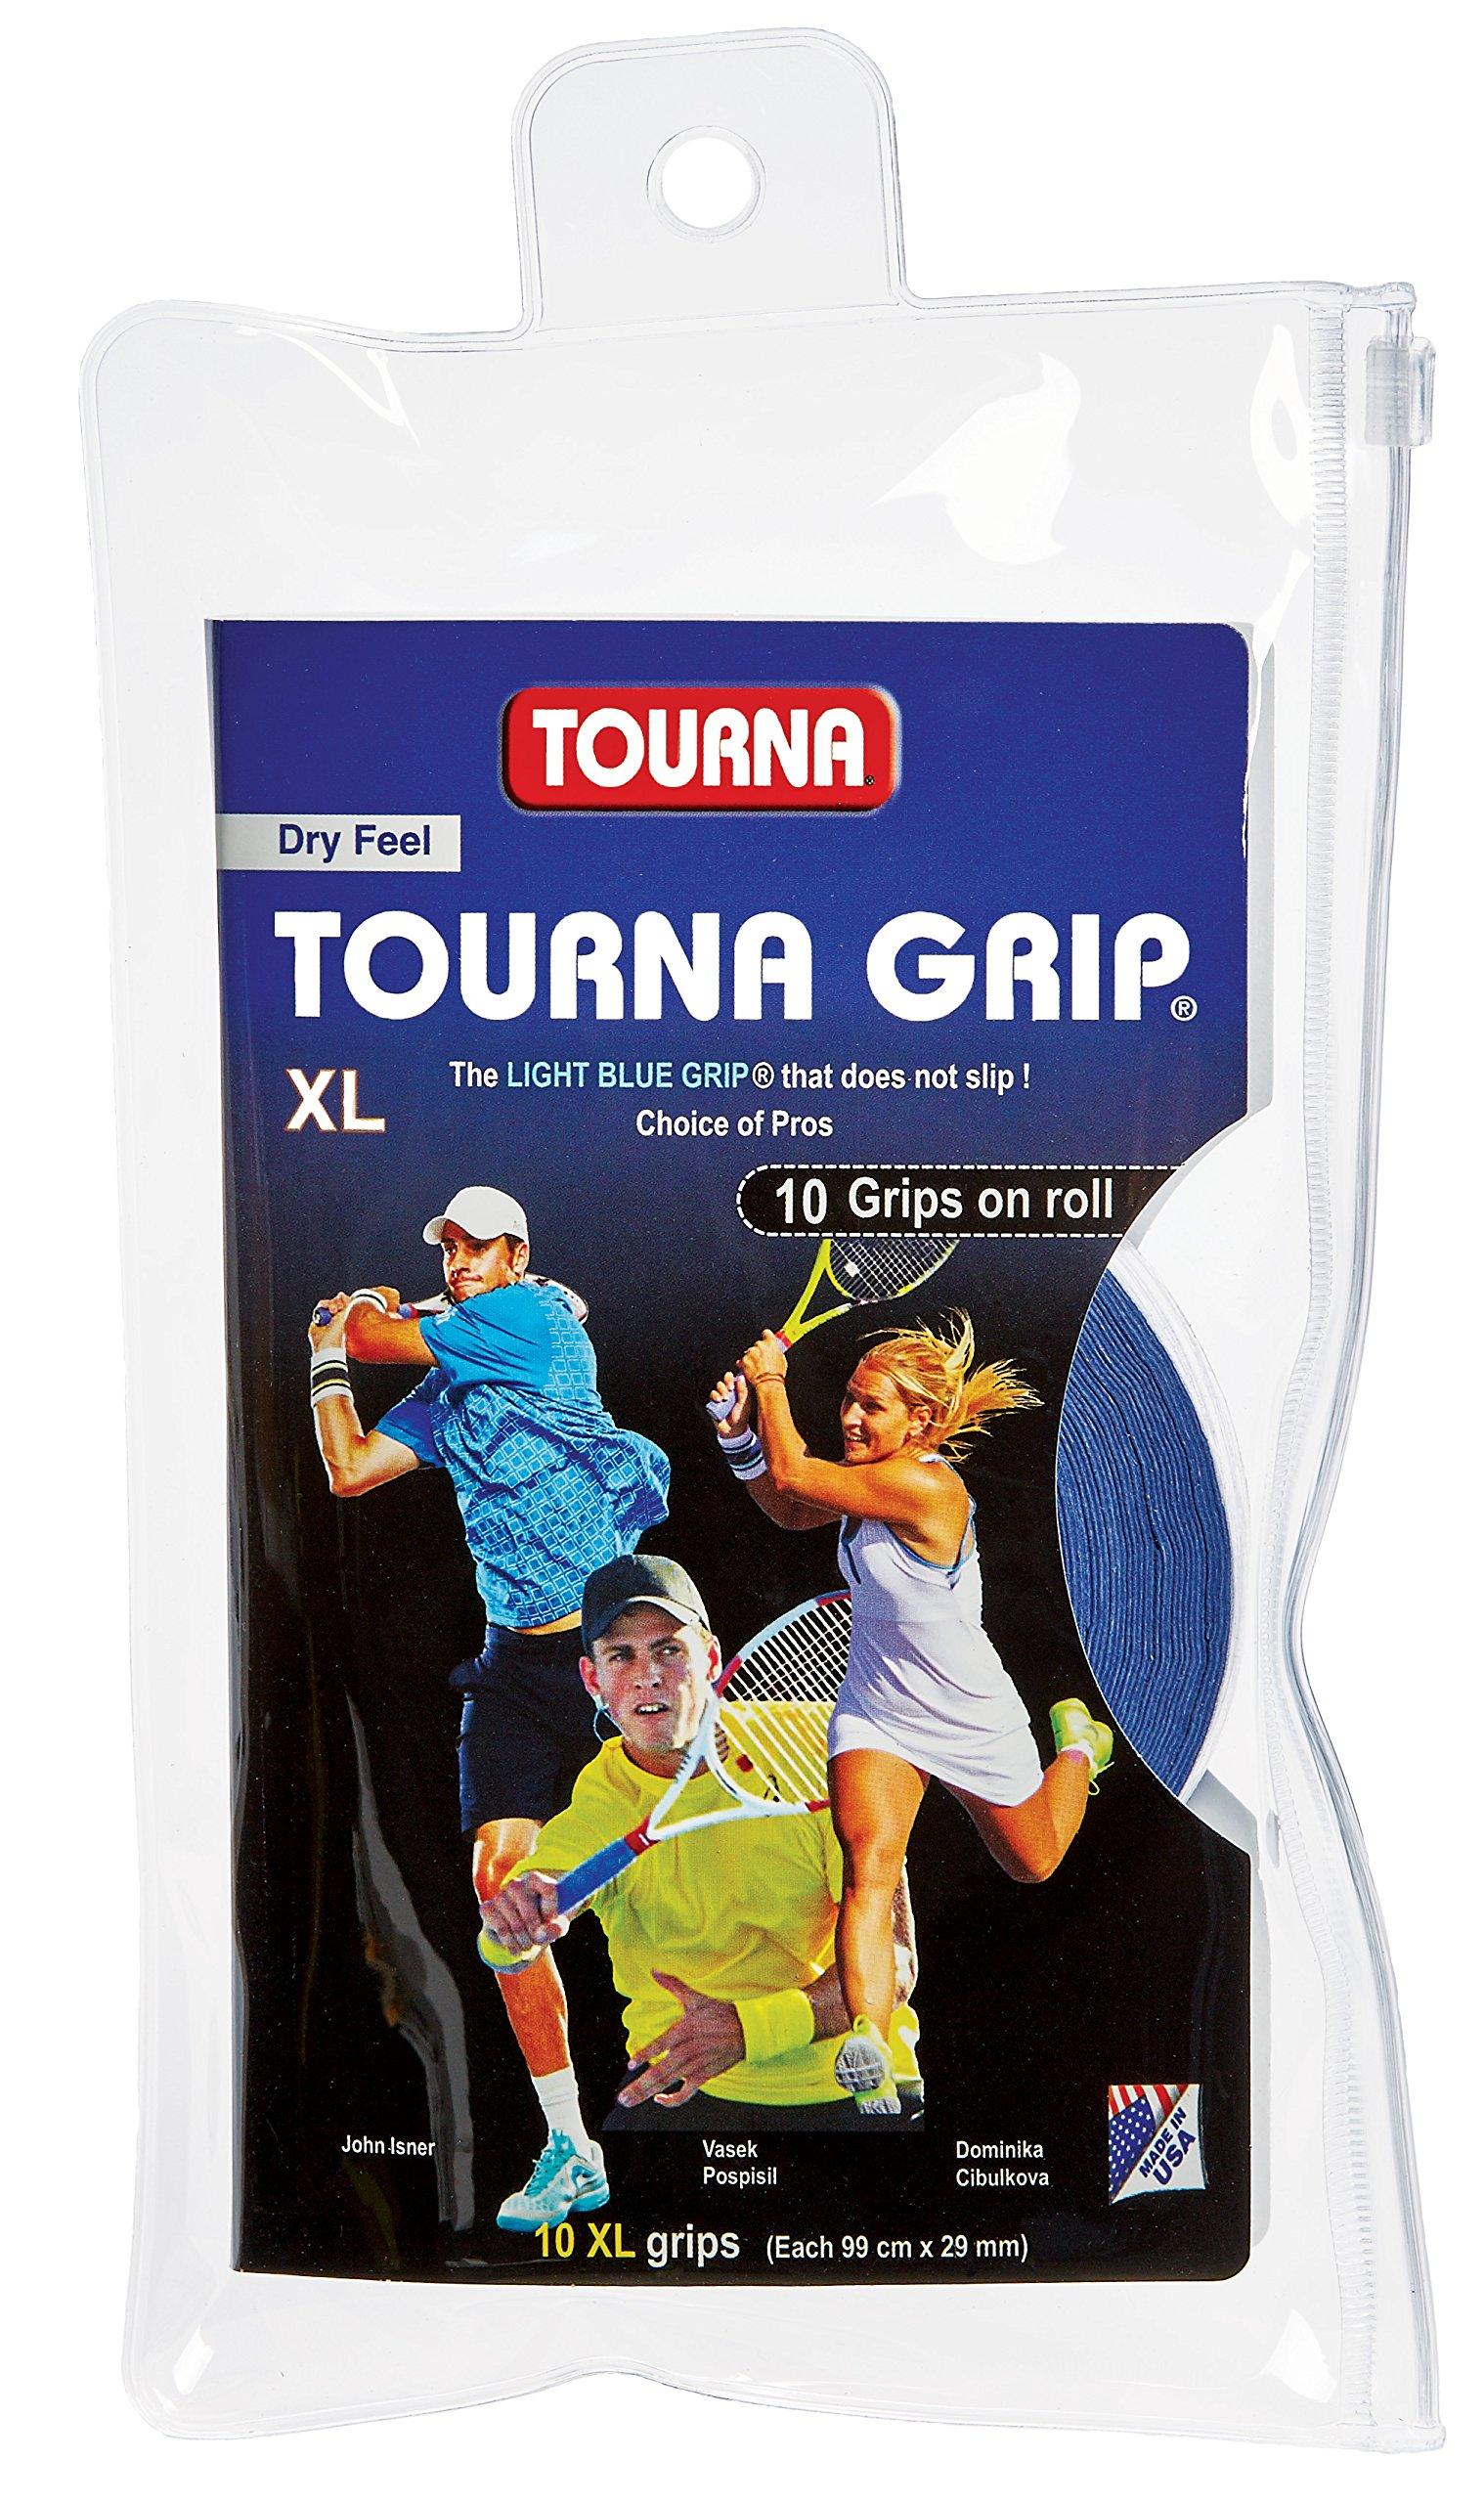 Tourna Grip XL Original Dry Feel Tennis Grip product image